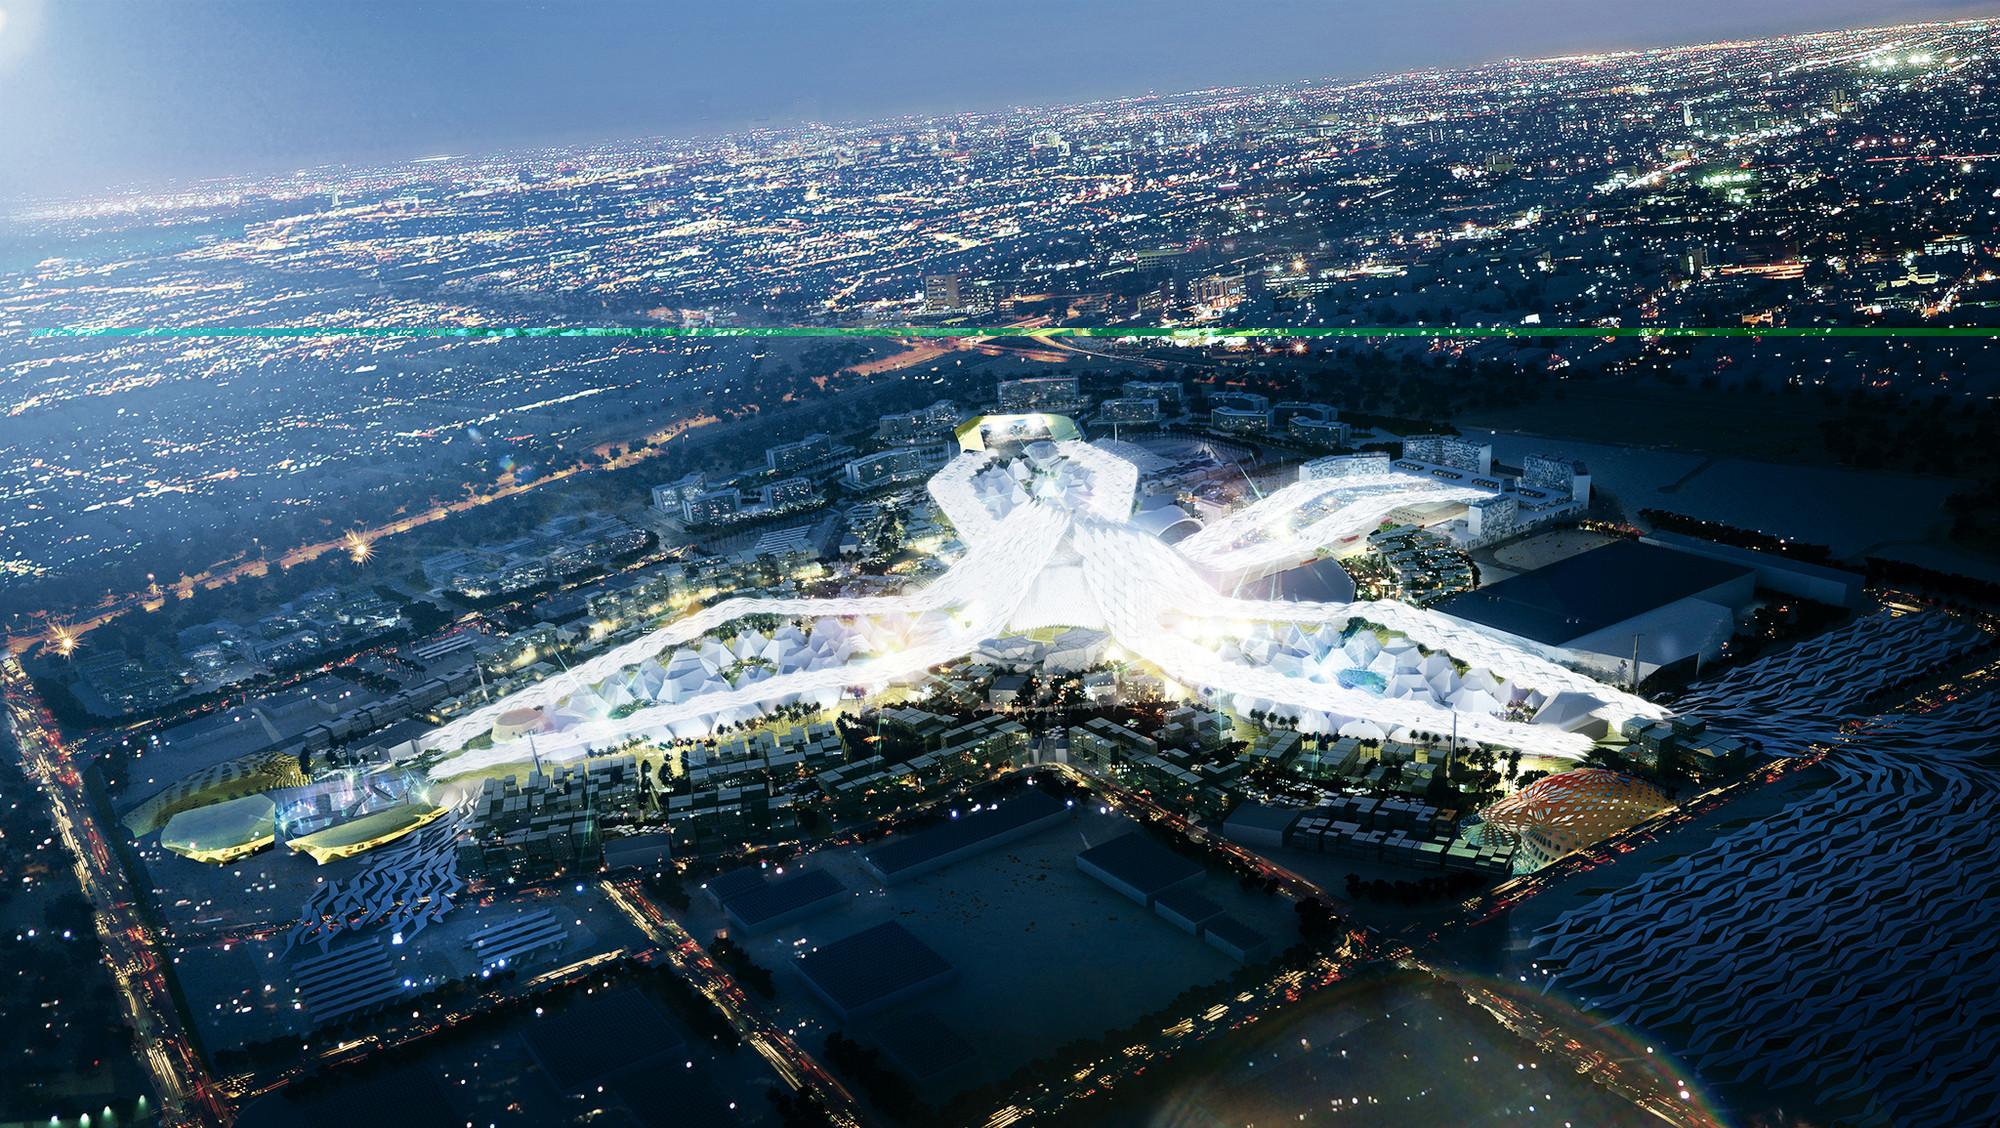 Se revela el Plan Maestro para la Exposición Universal Dubai 2020, © Vía DubaiGoldPrices.com